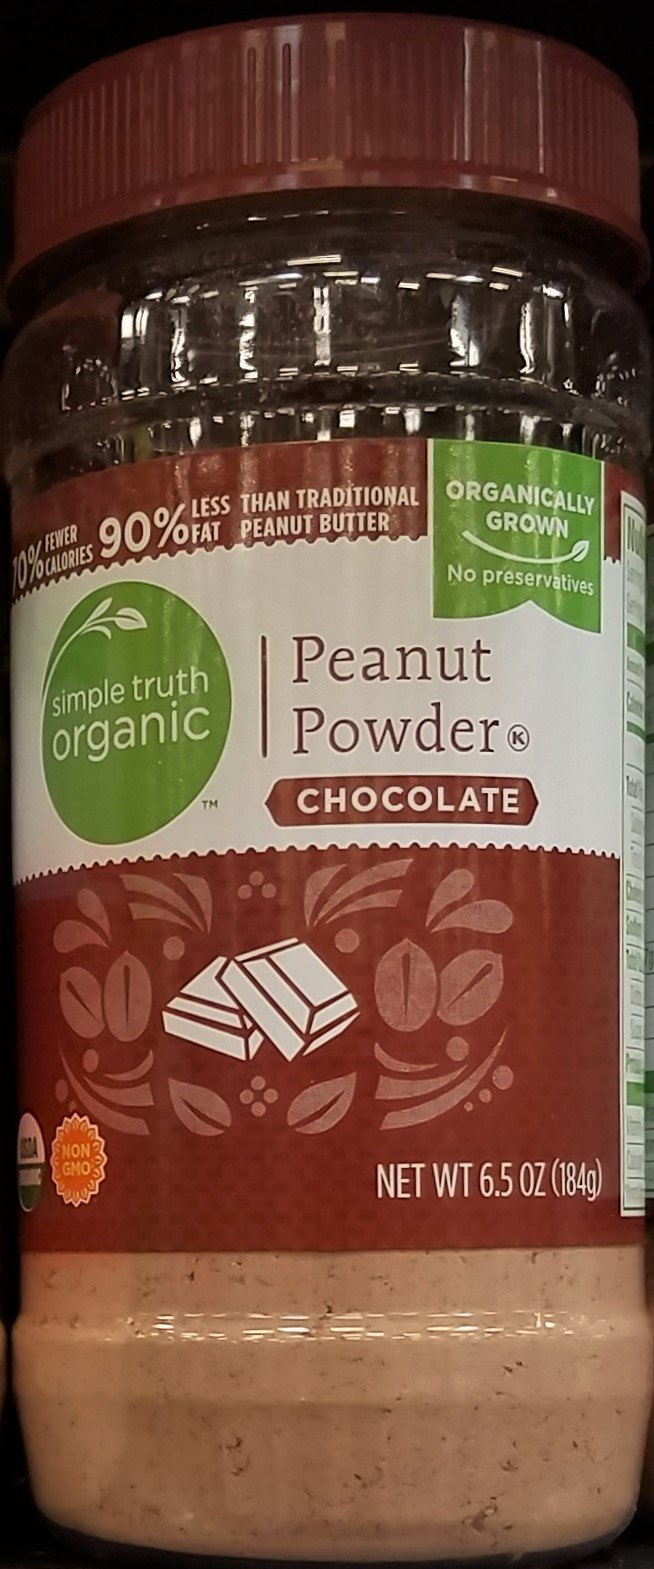 Simple Truth Organic Peanut Powder - Chocolate 6.5 oz (Pack of 2)